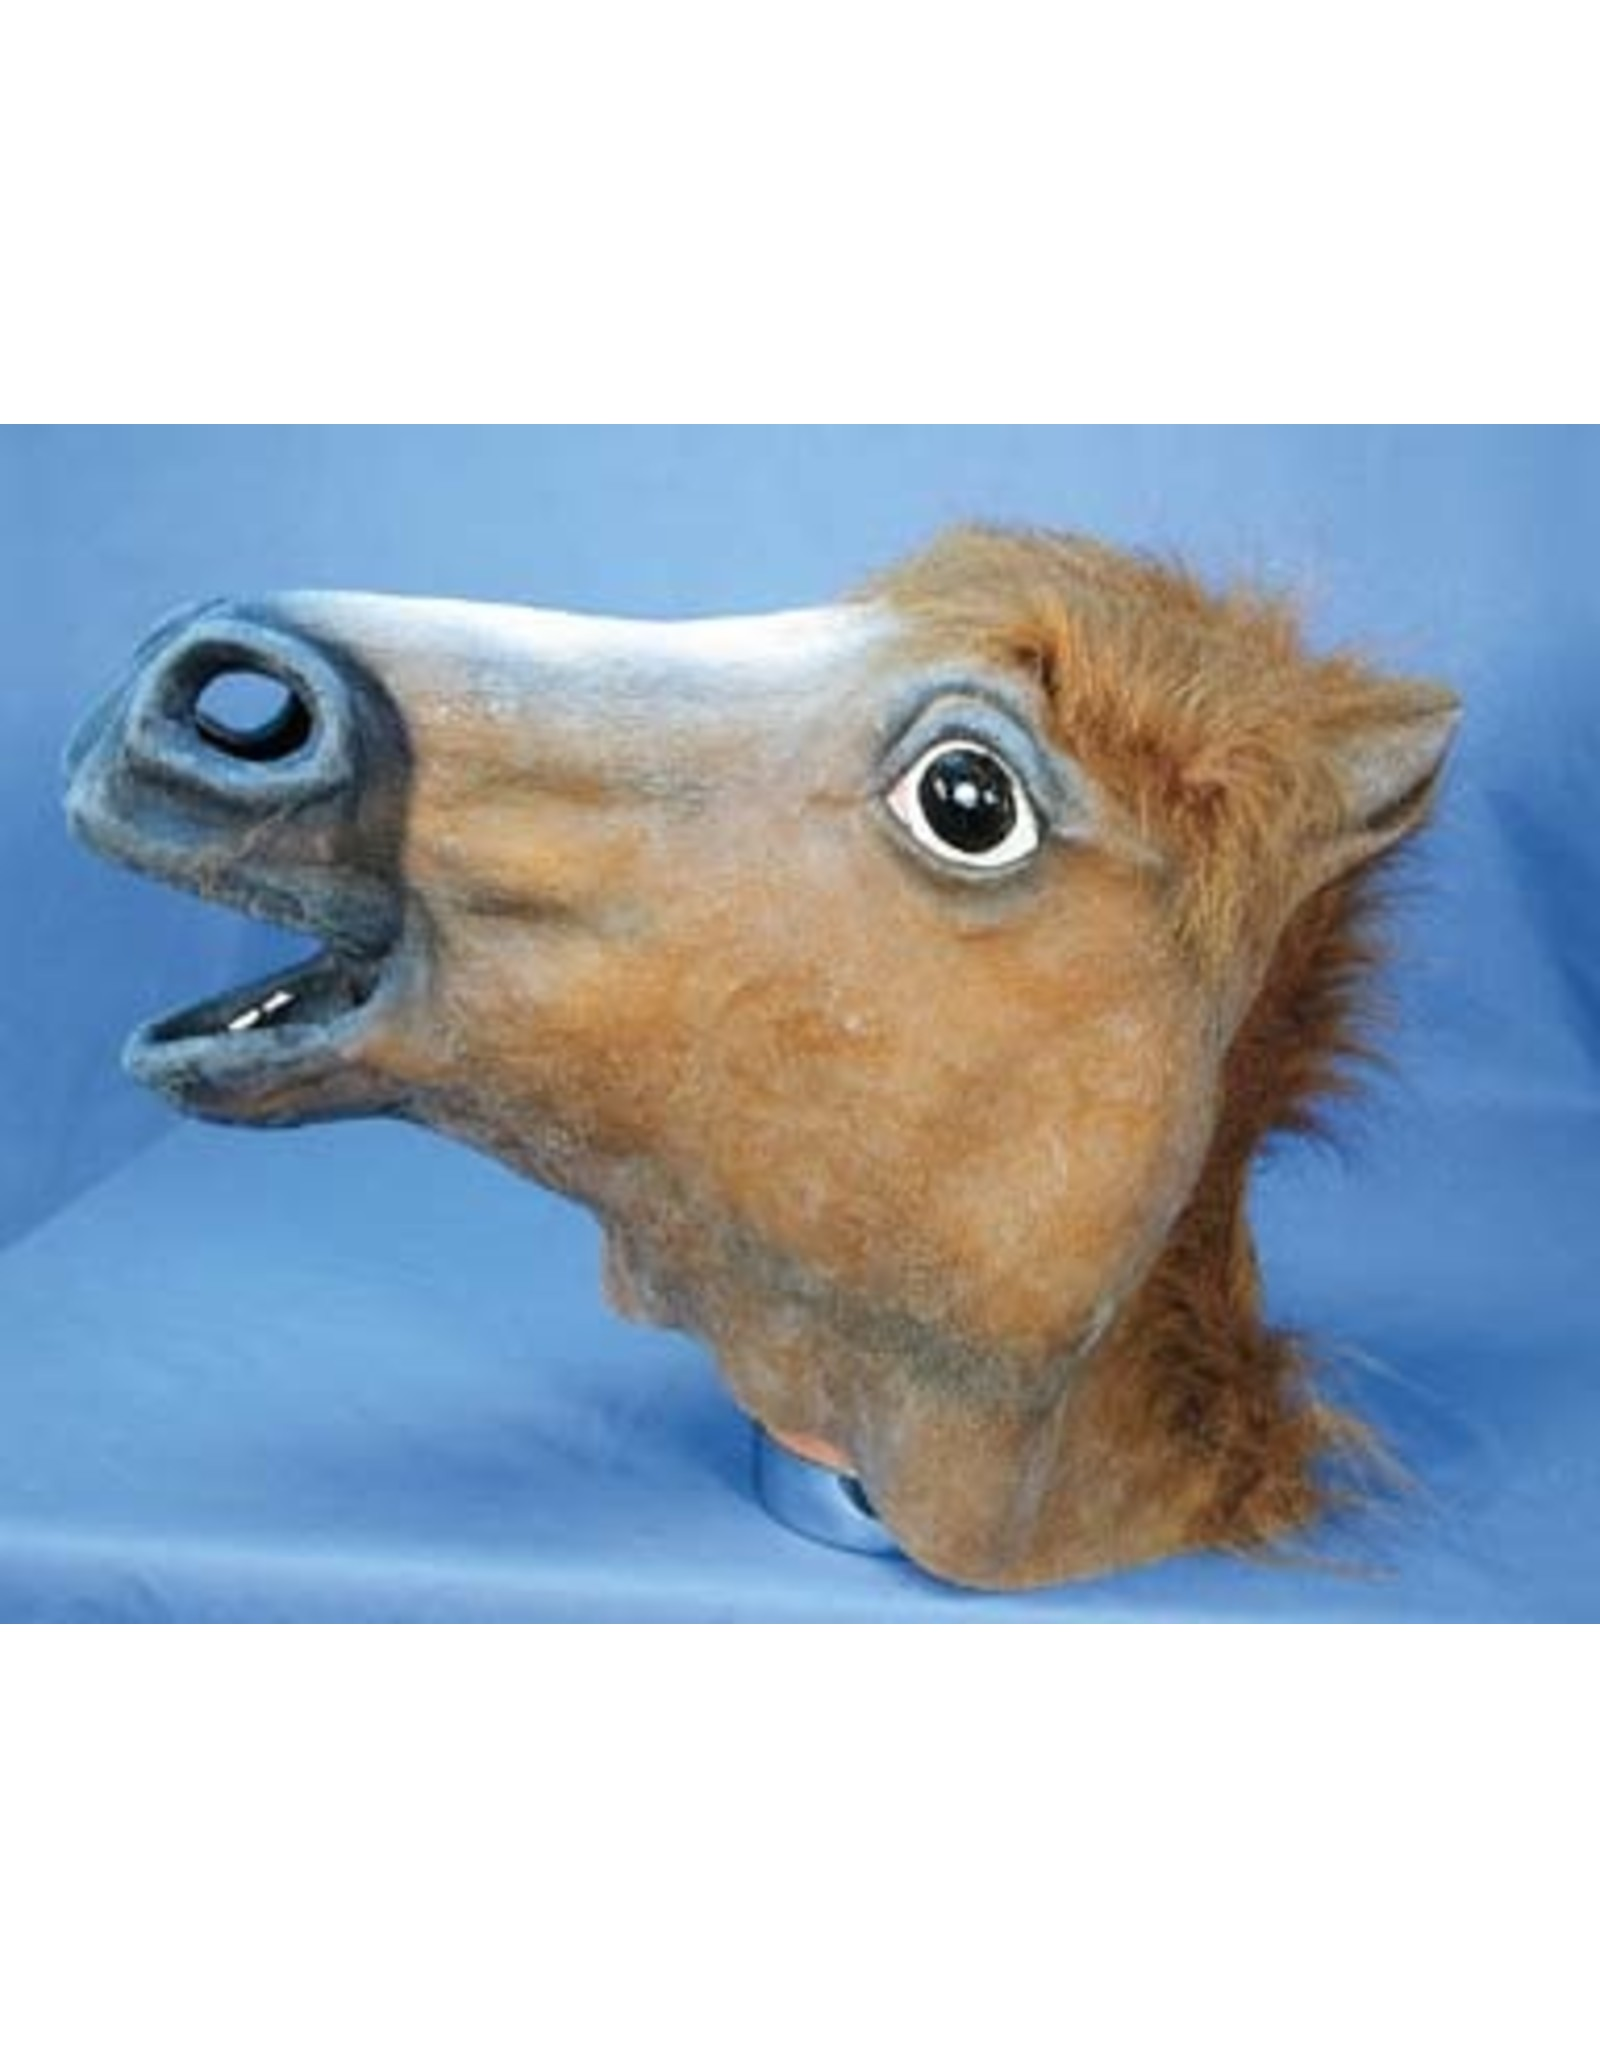 HM Smallwares Horse Mask